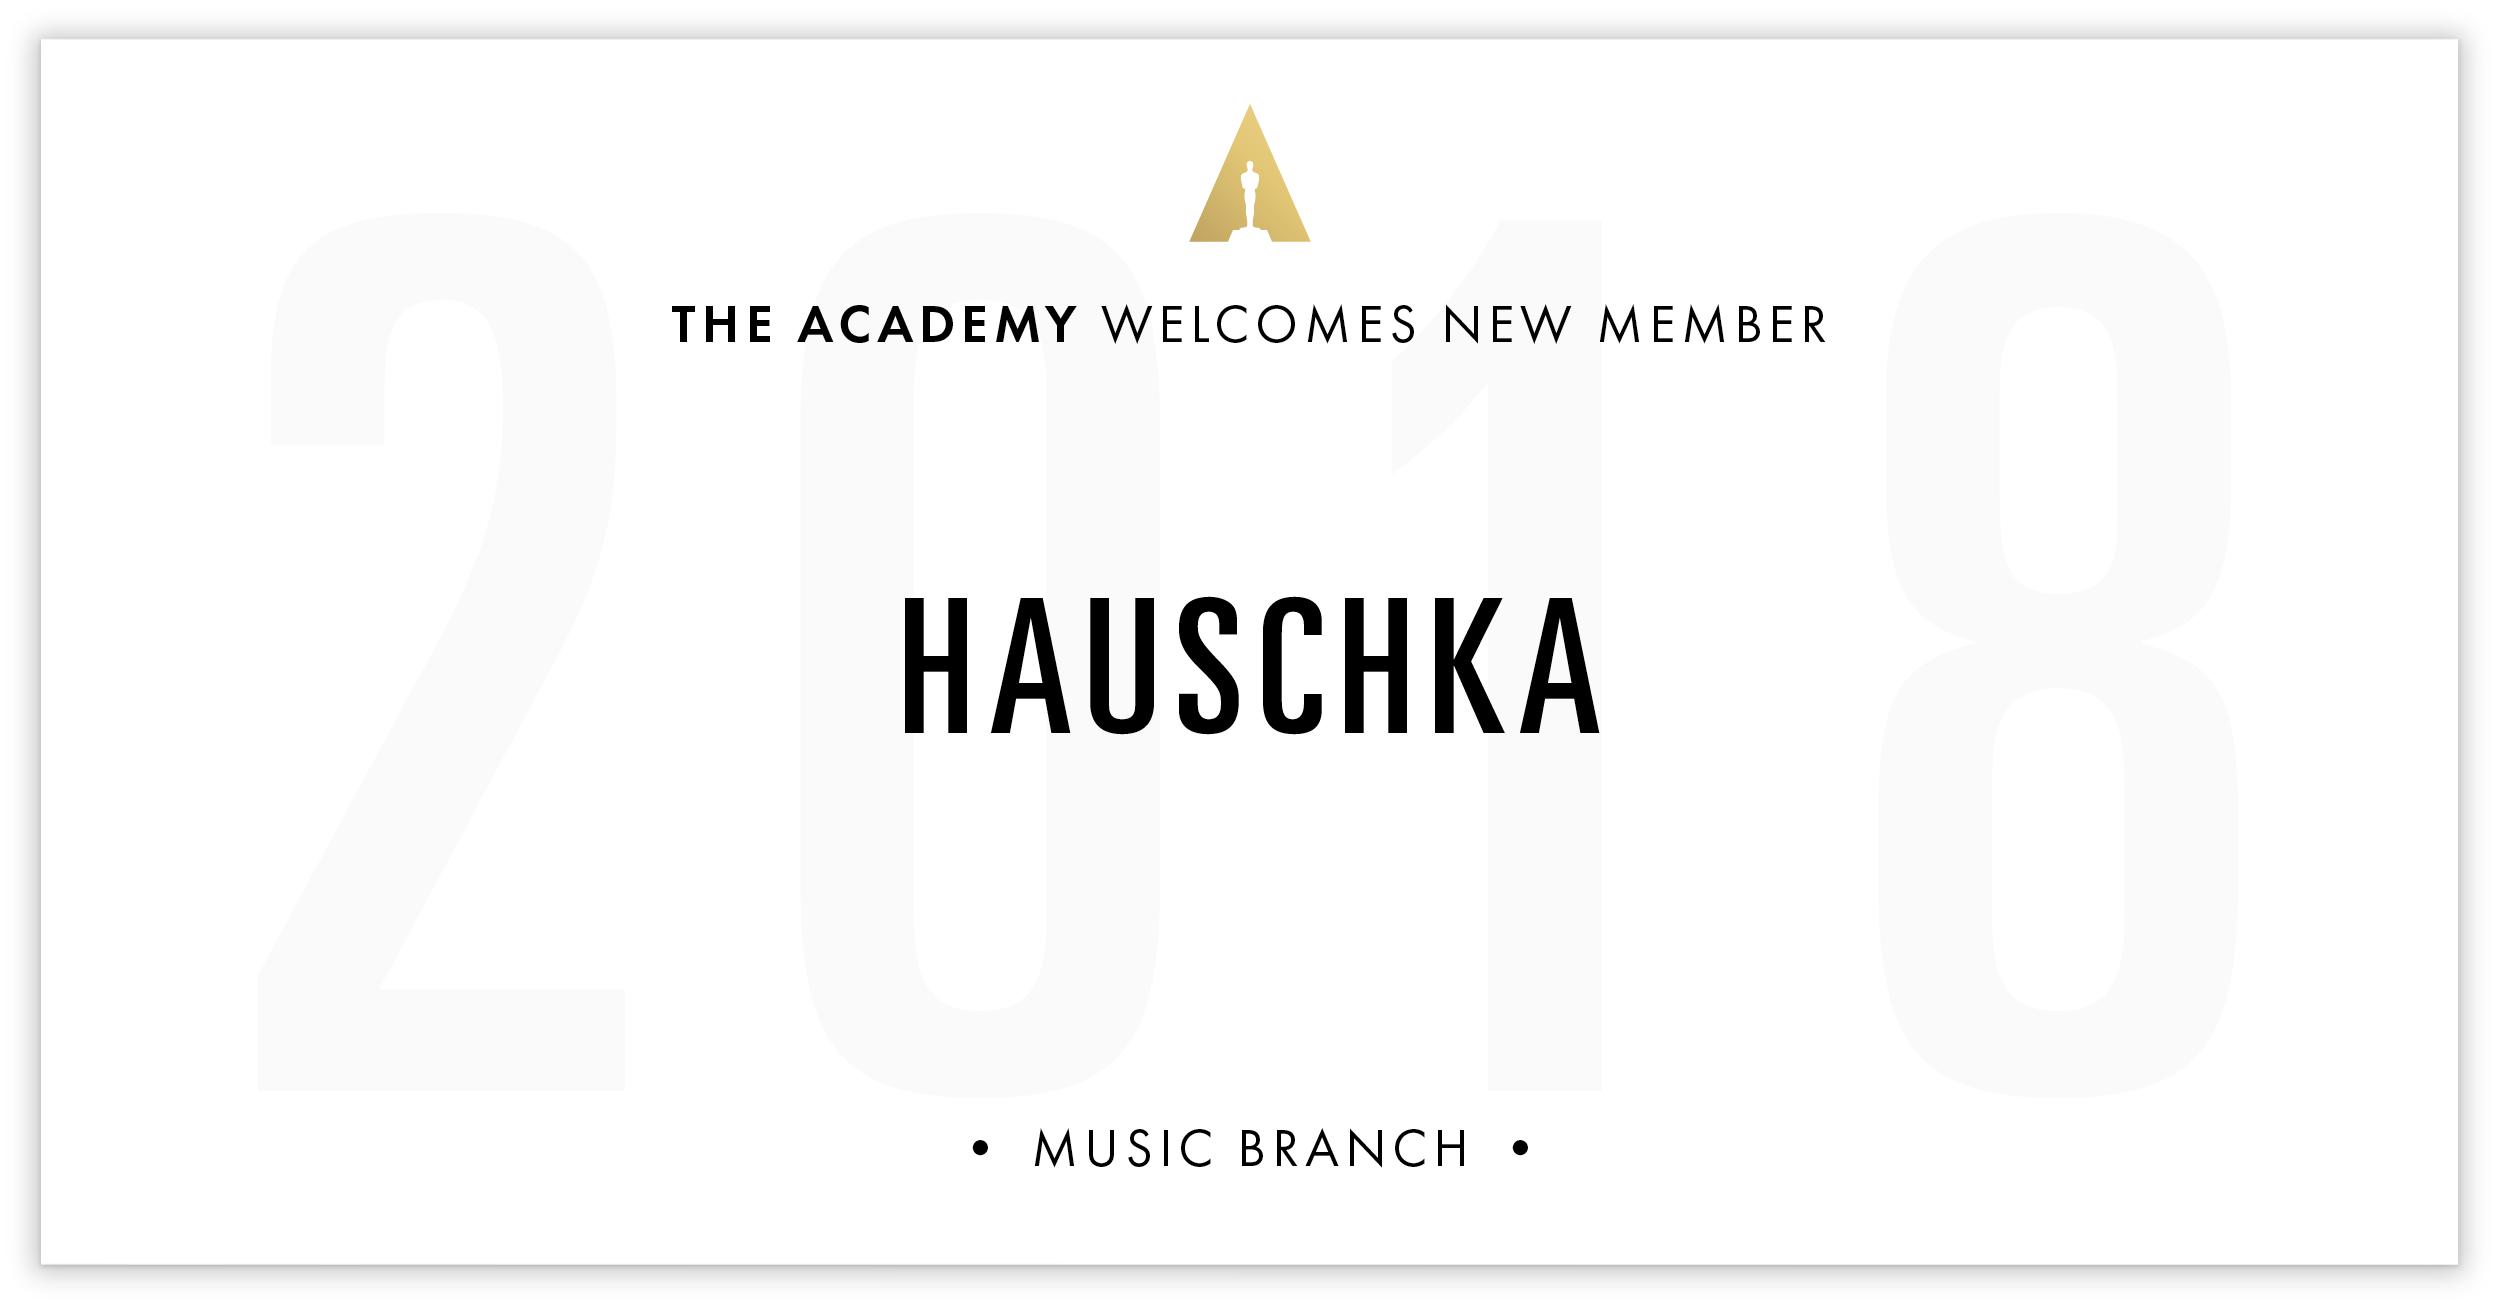 Hauschka is invited!